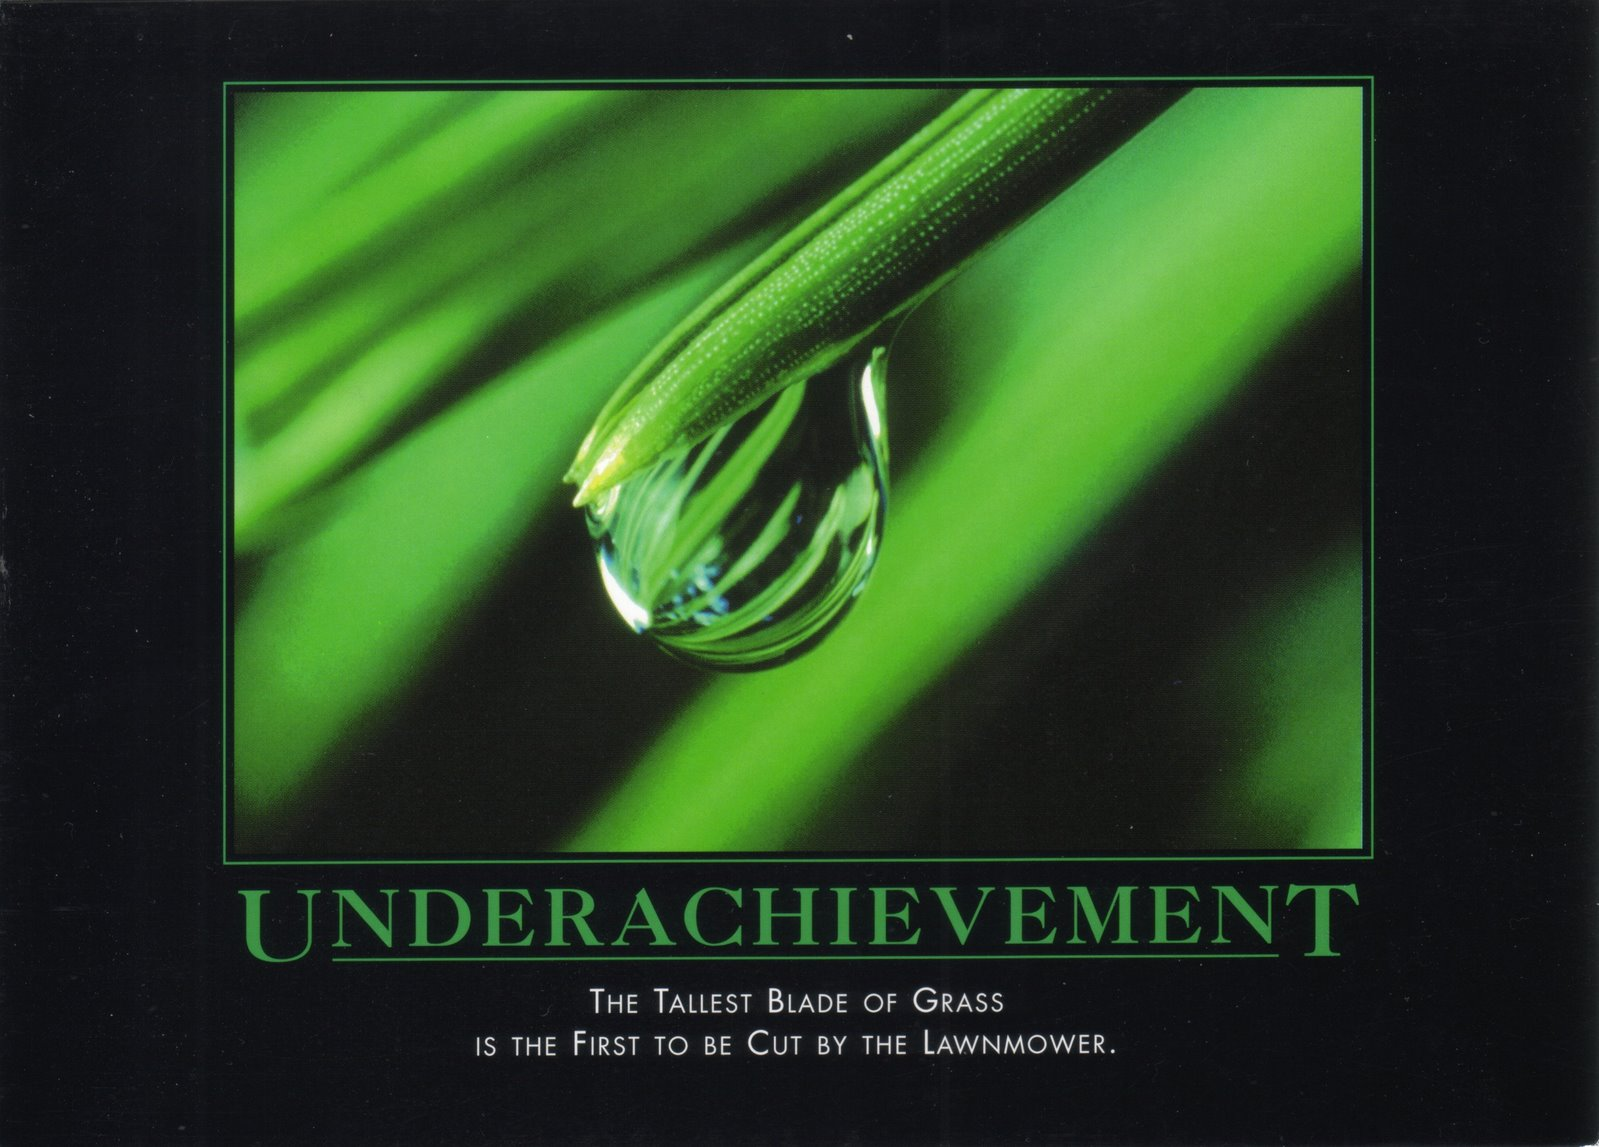 Underachievement Card Image